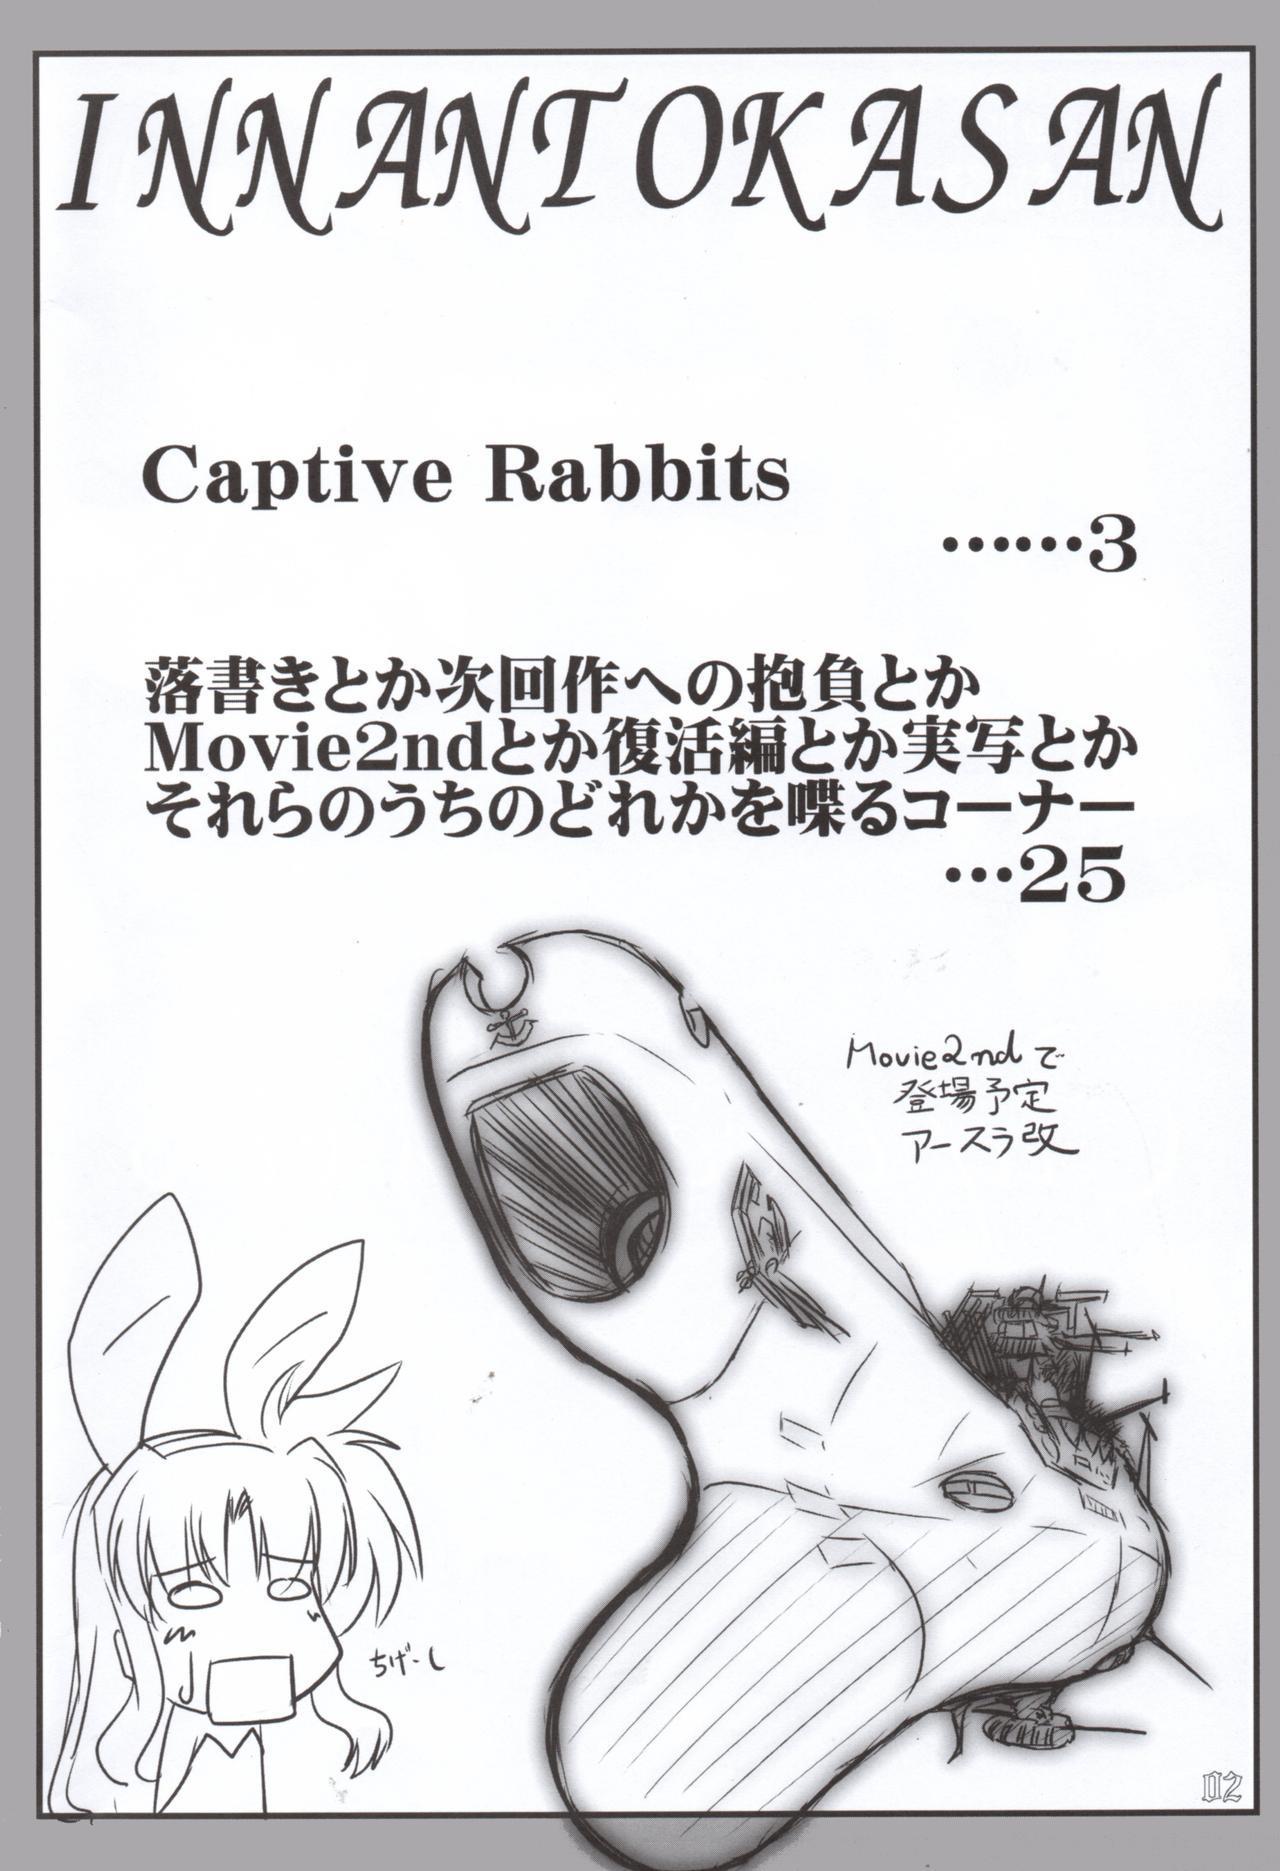 Captive Rabbitl 2